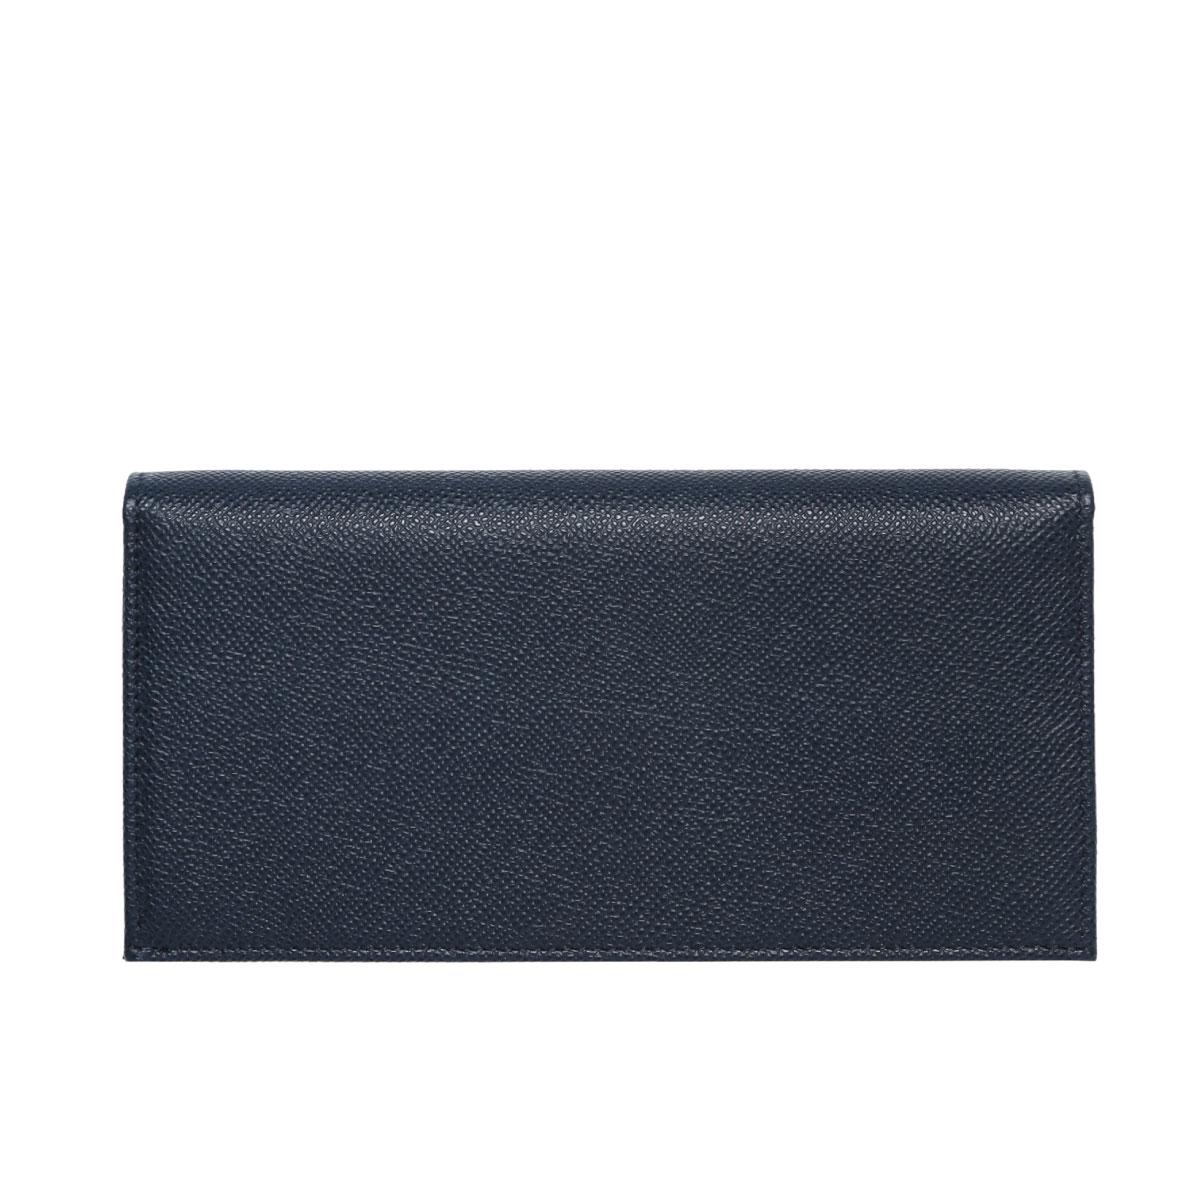 5921e942 286057 Bulgari BVLGARI wallet men folio long wallet BVLGARI BVLGARI MAN  Bulgari Bulgari man DENIM SAPPHIRE/PALLADIUM blue